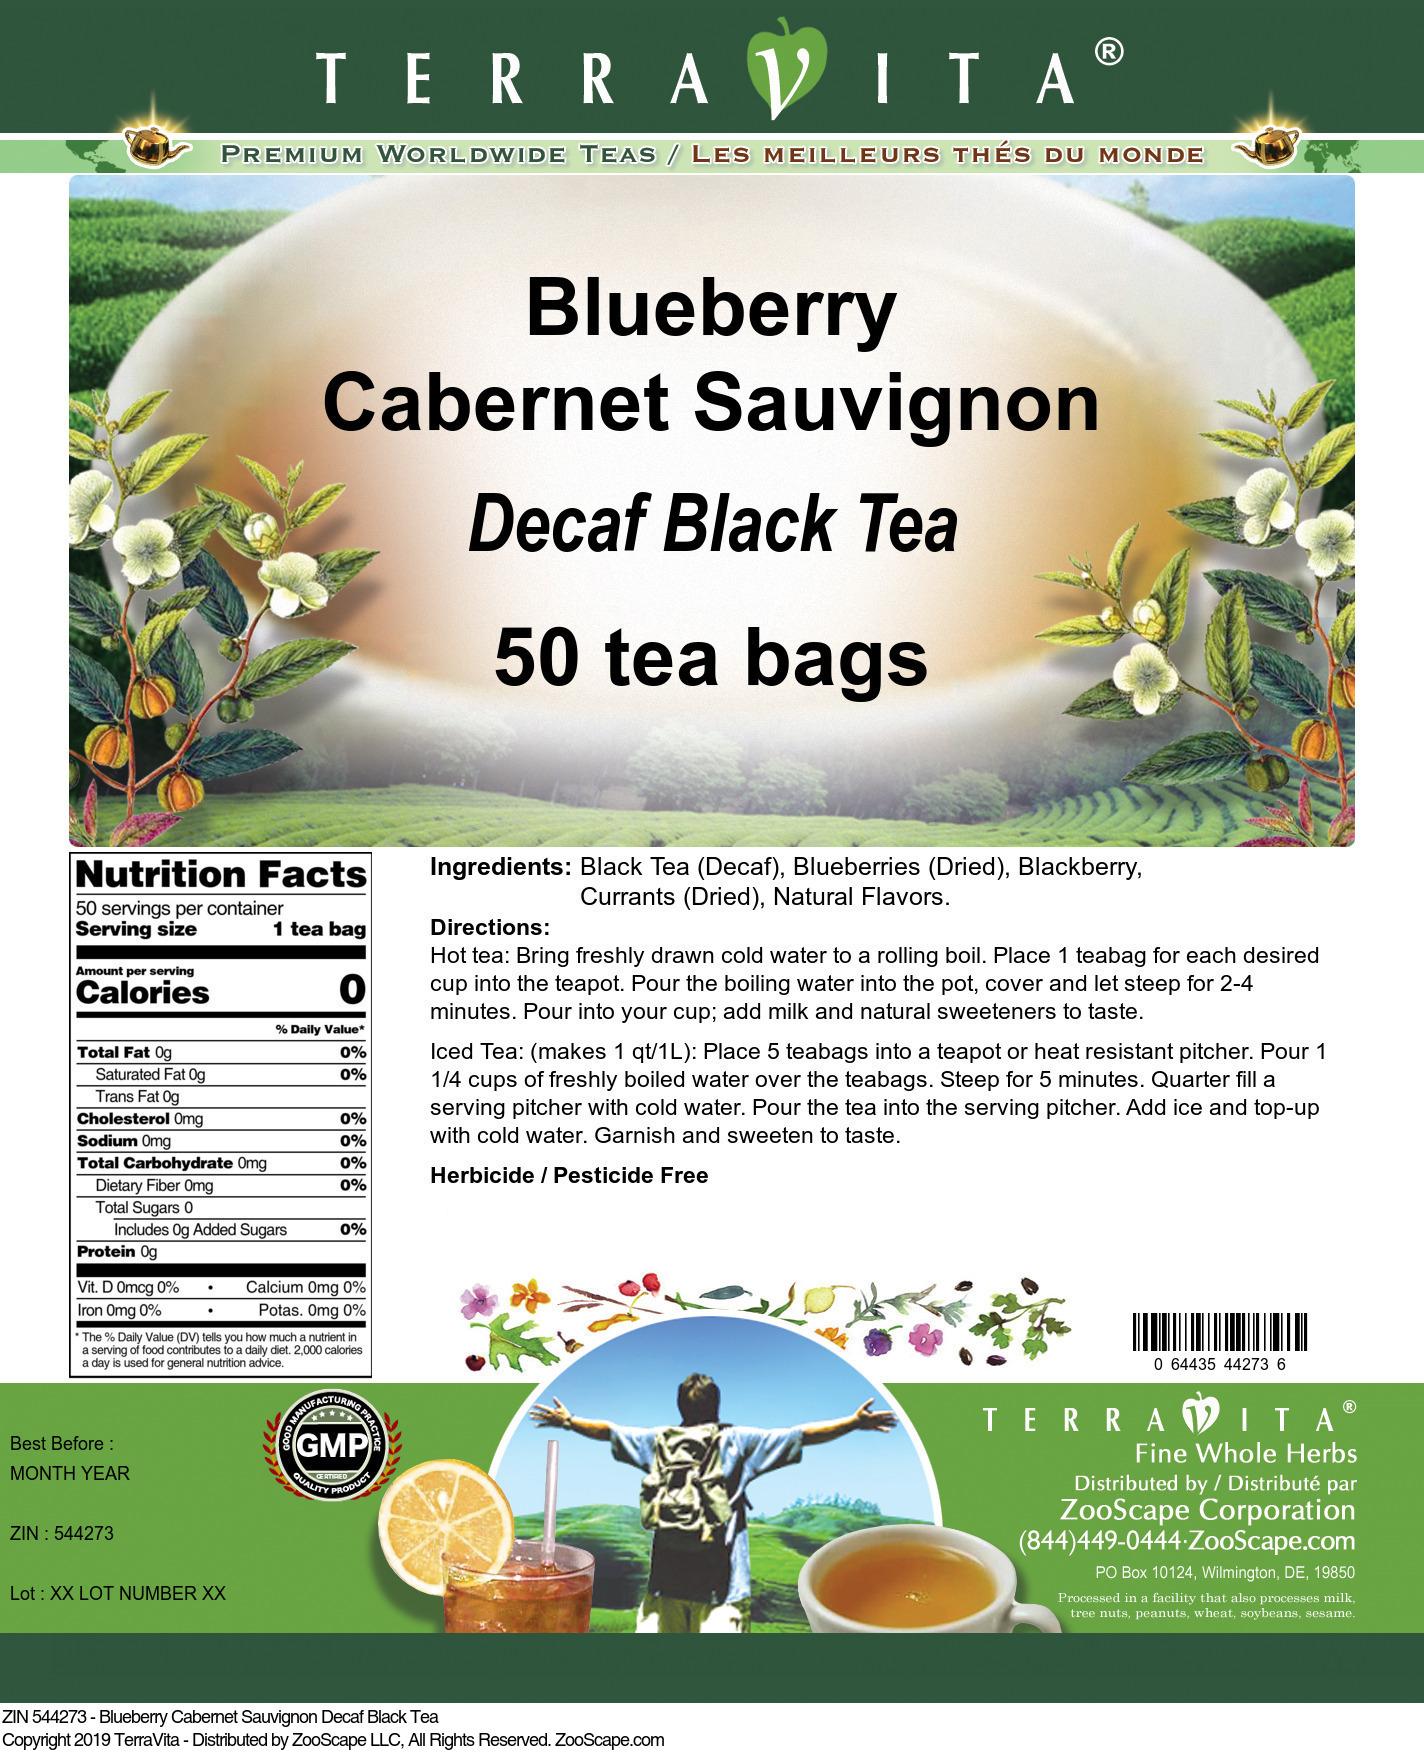 Blueberry Cabernet Sauvignon Decaf Black Tea